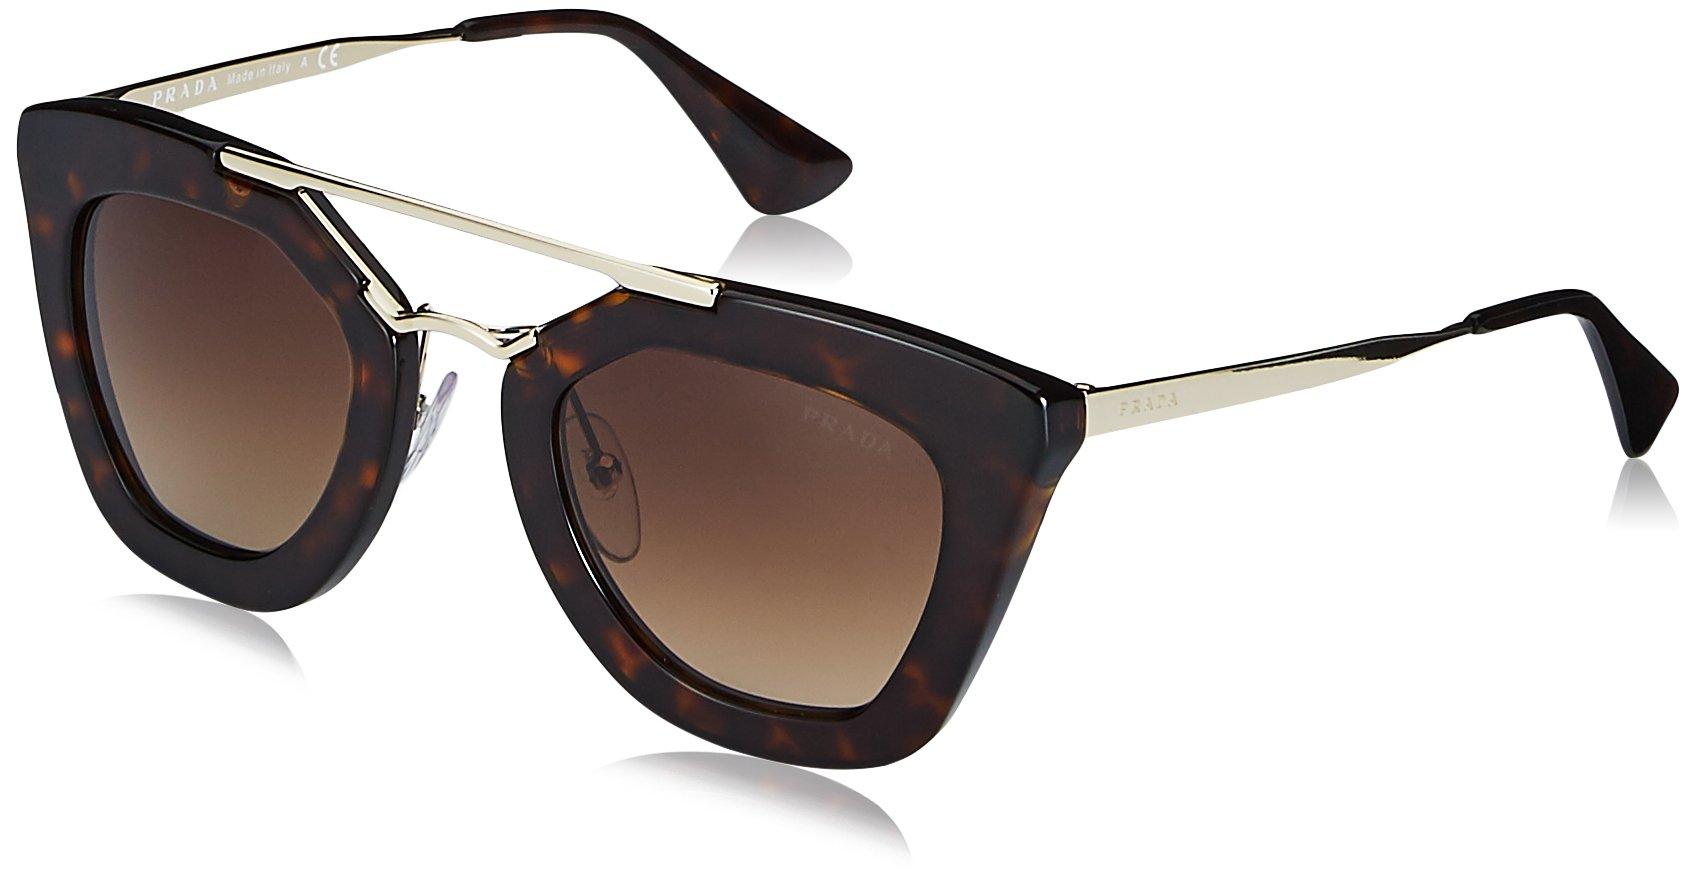 Prada Women's SPR09Q Cinema Sunglasses, Havana, 49mm